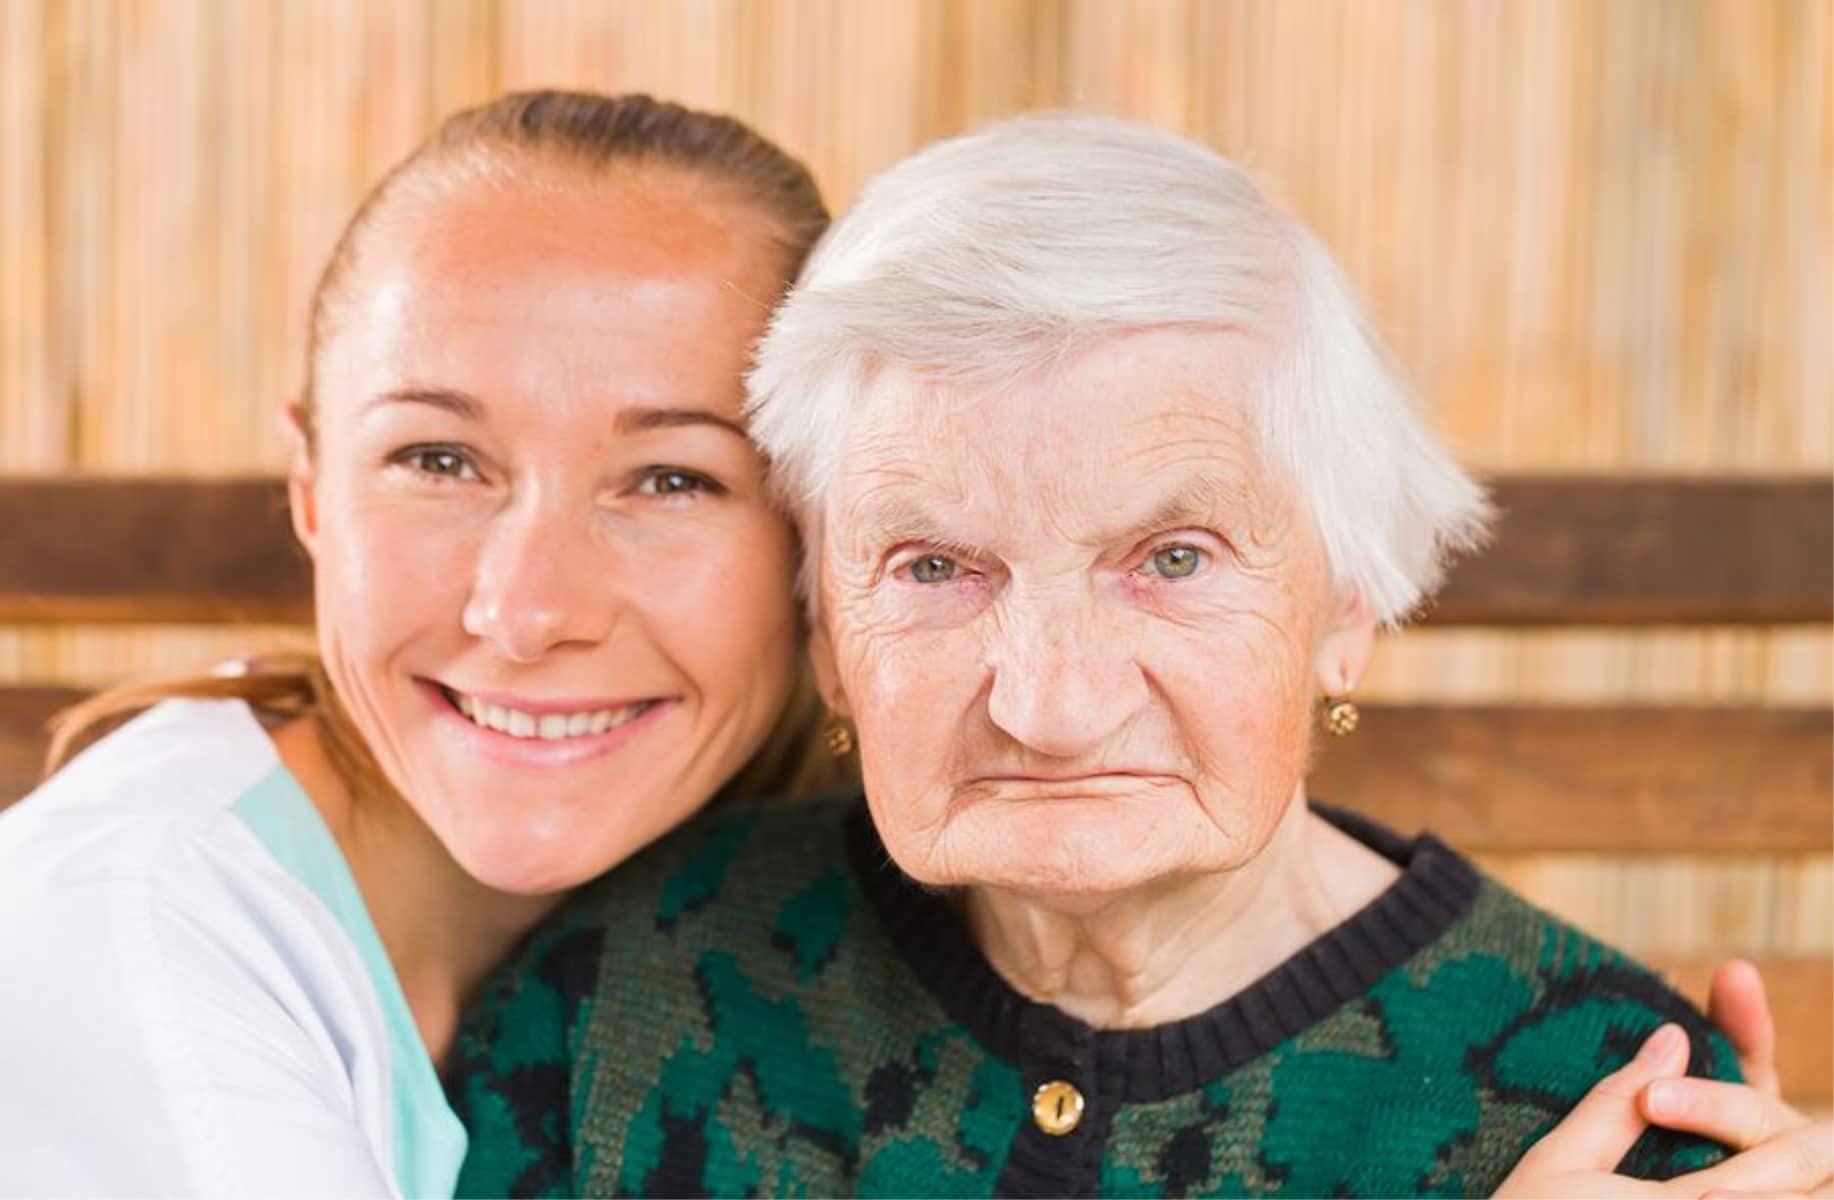 Elder Care in Flowery Branch GA: Dementia Caregiving Tips